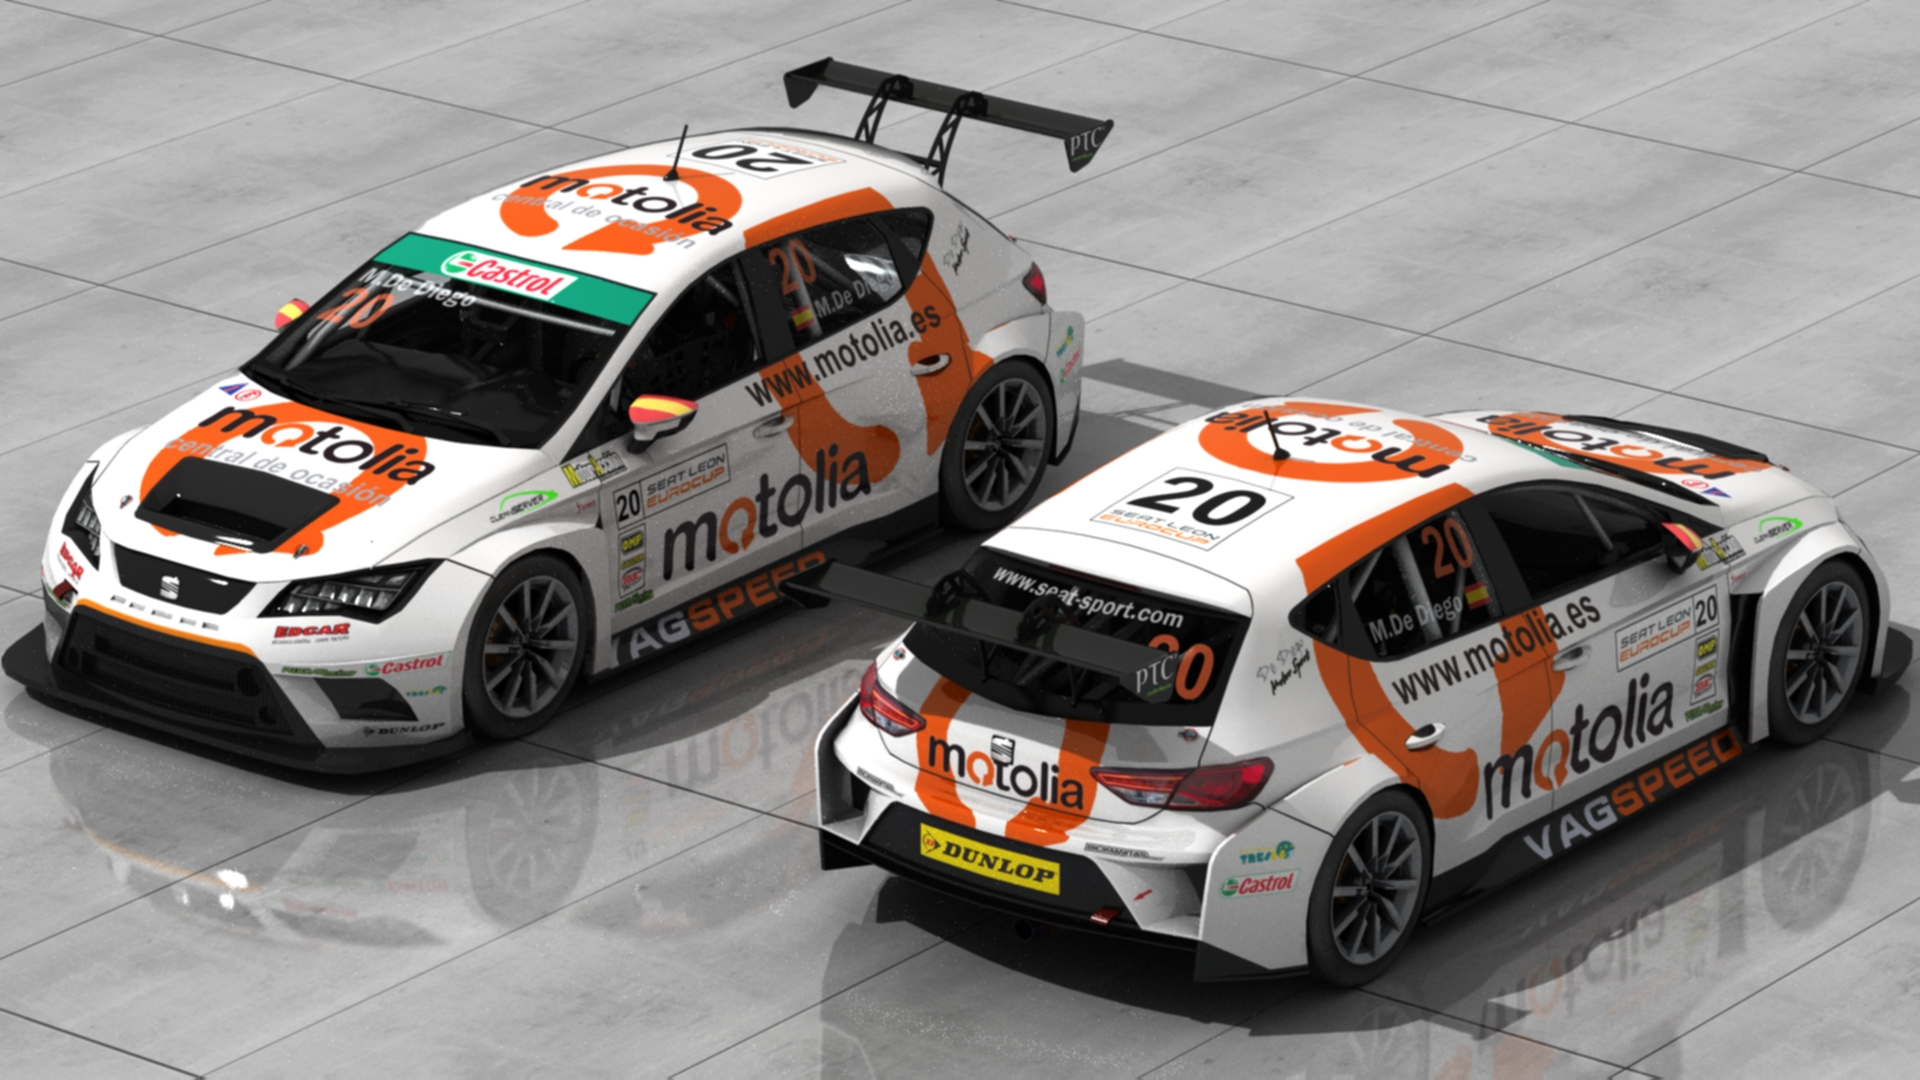 Seat Leon 2019 >> Seat Leon Cup 2015 - Assetto Corsa Mods